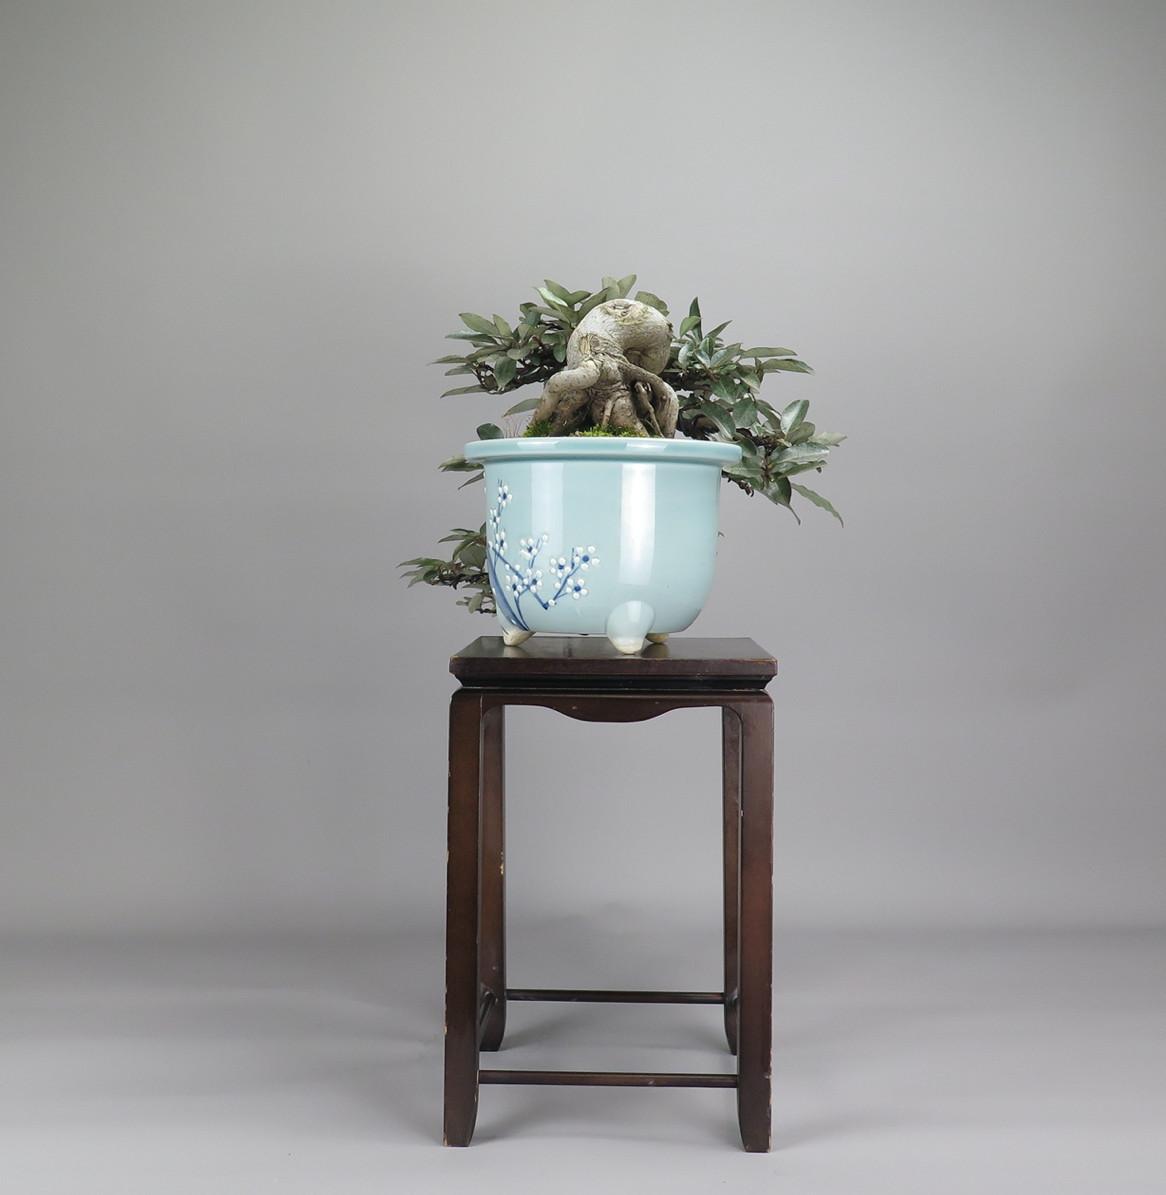 Bonsai de Eleagnus, lateral izquierdo